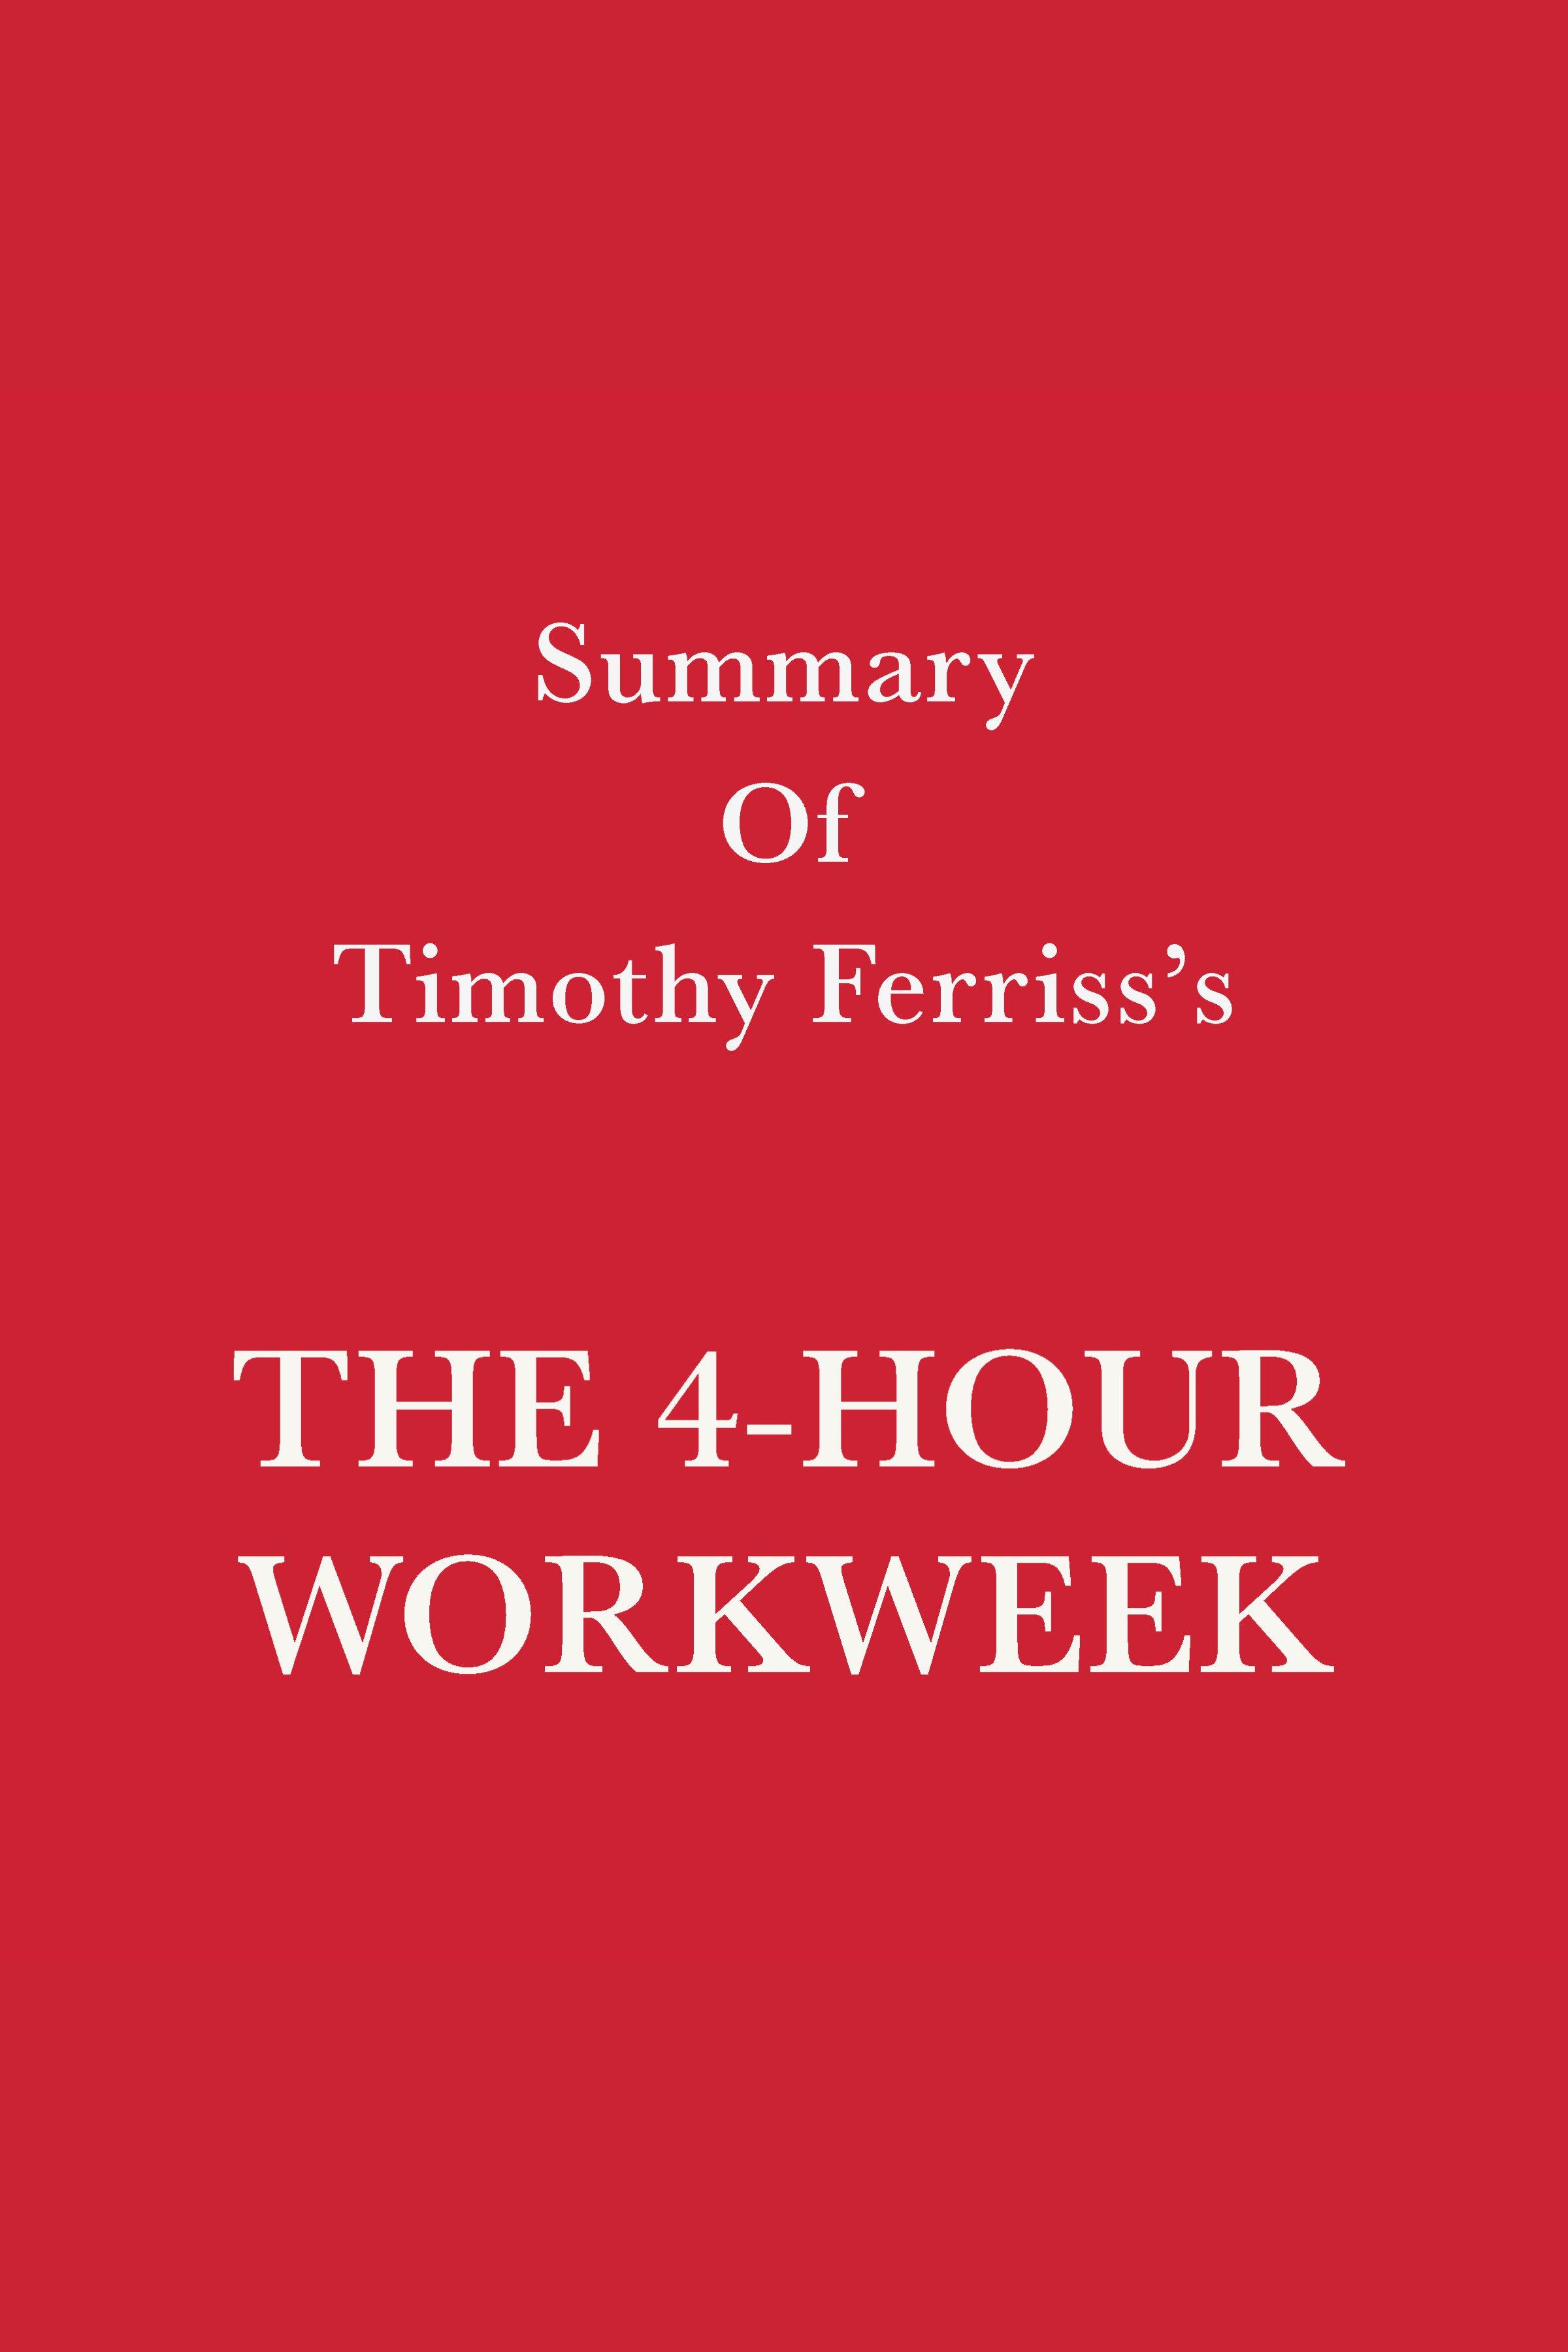 Esta es la portada del audiolibro Summary of Timothy Ferriss's The 4-Hour Workweek